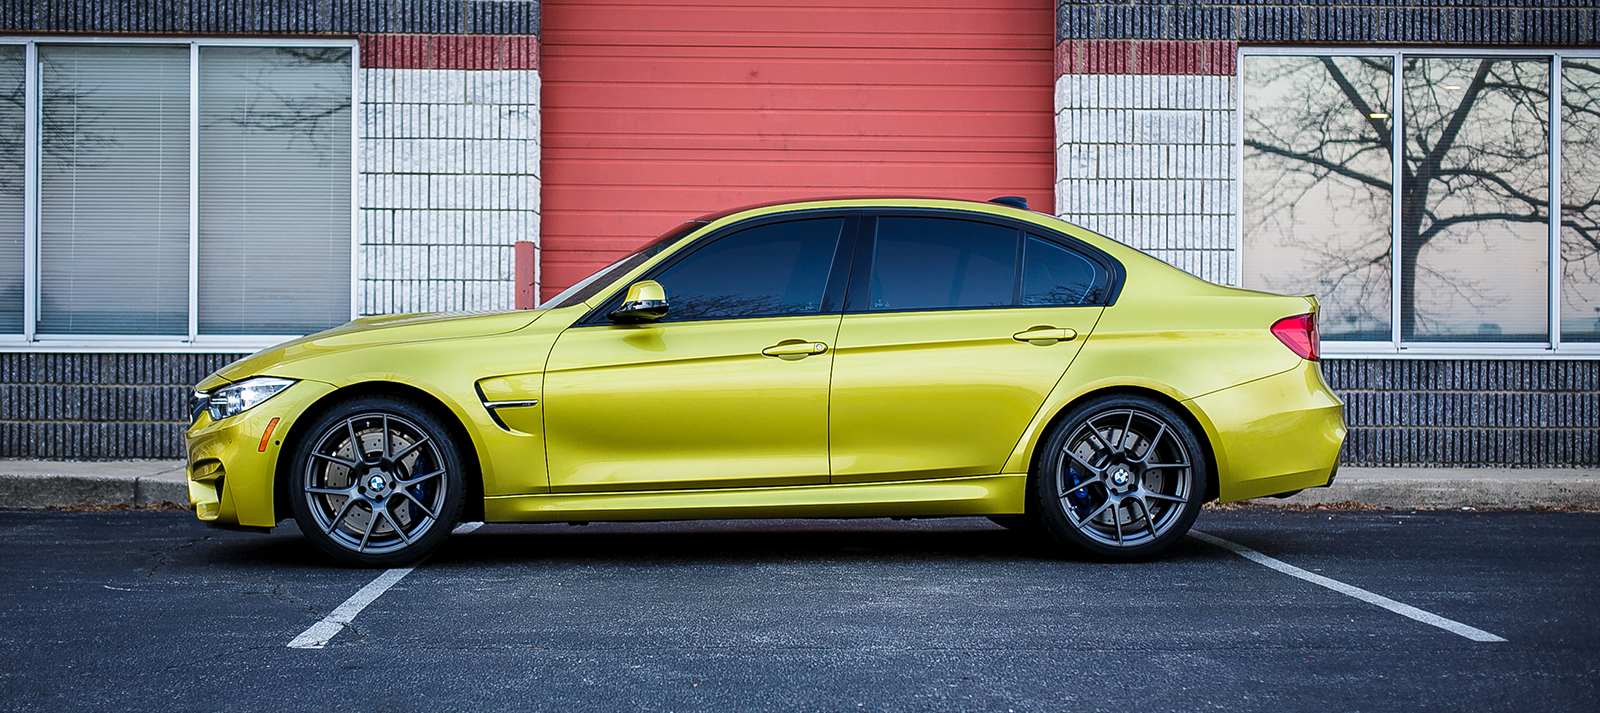 BMW F80 19